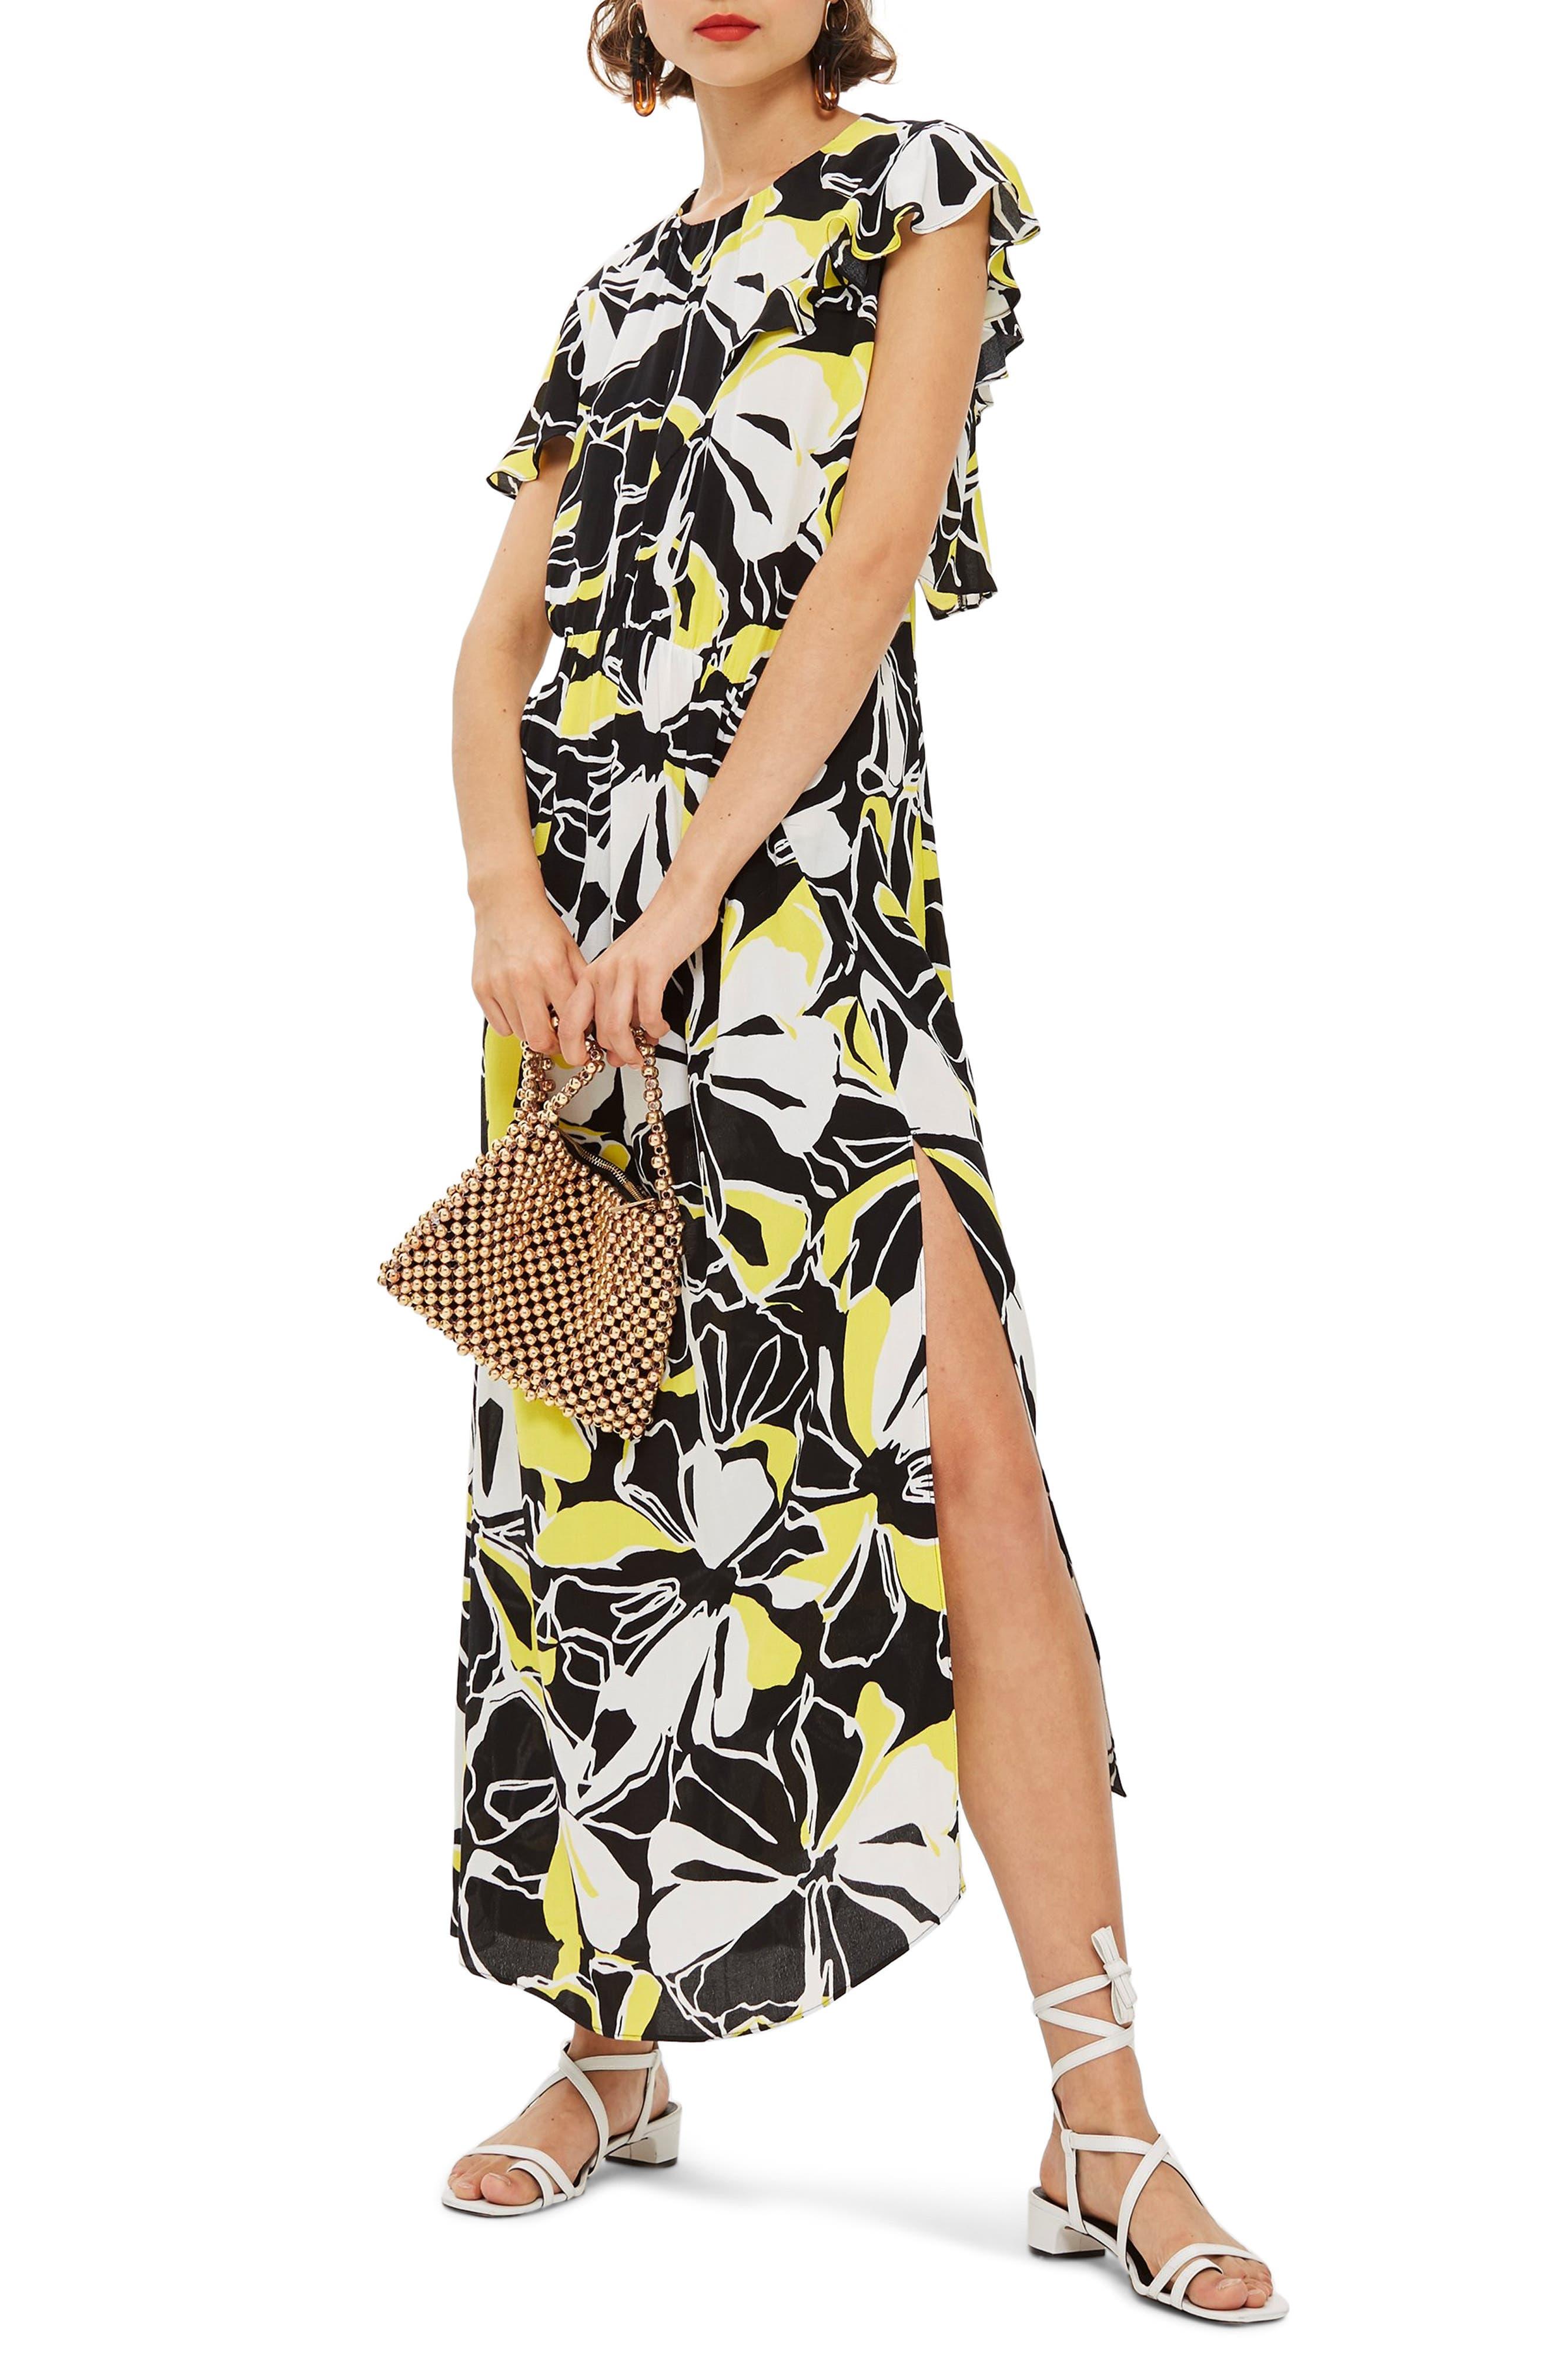 Deconstructed Floral Print Maxi Dress,                         Main,                         color, BLACK MULTI